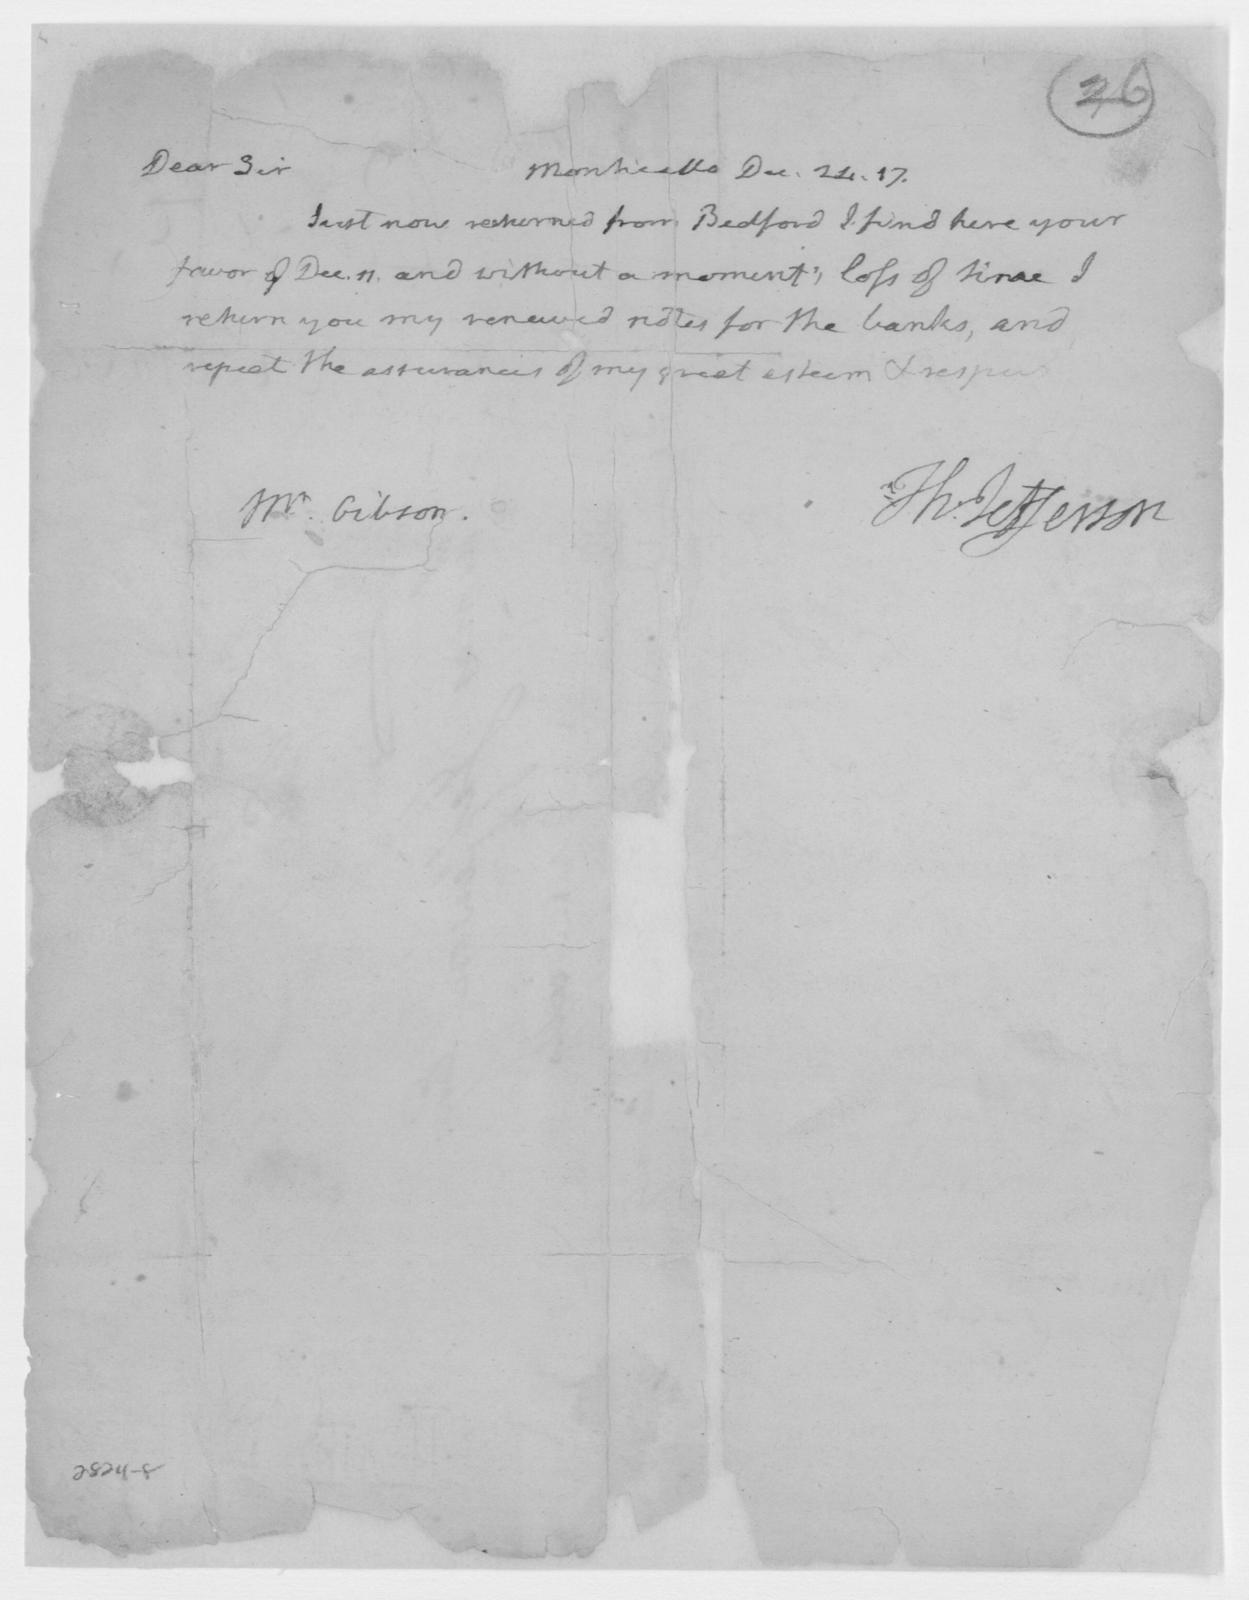 Thomas Jefferson to Patrick Gibson, December 24, 1816